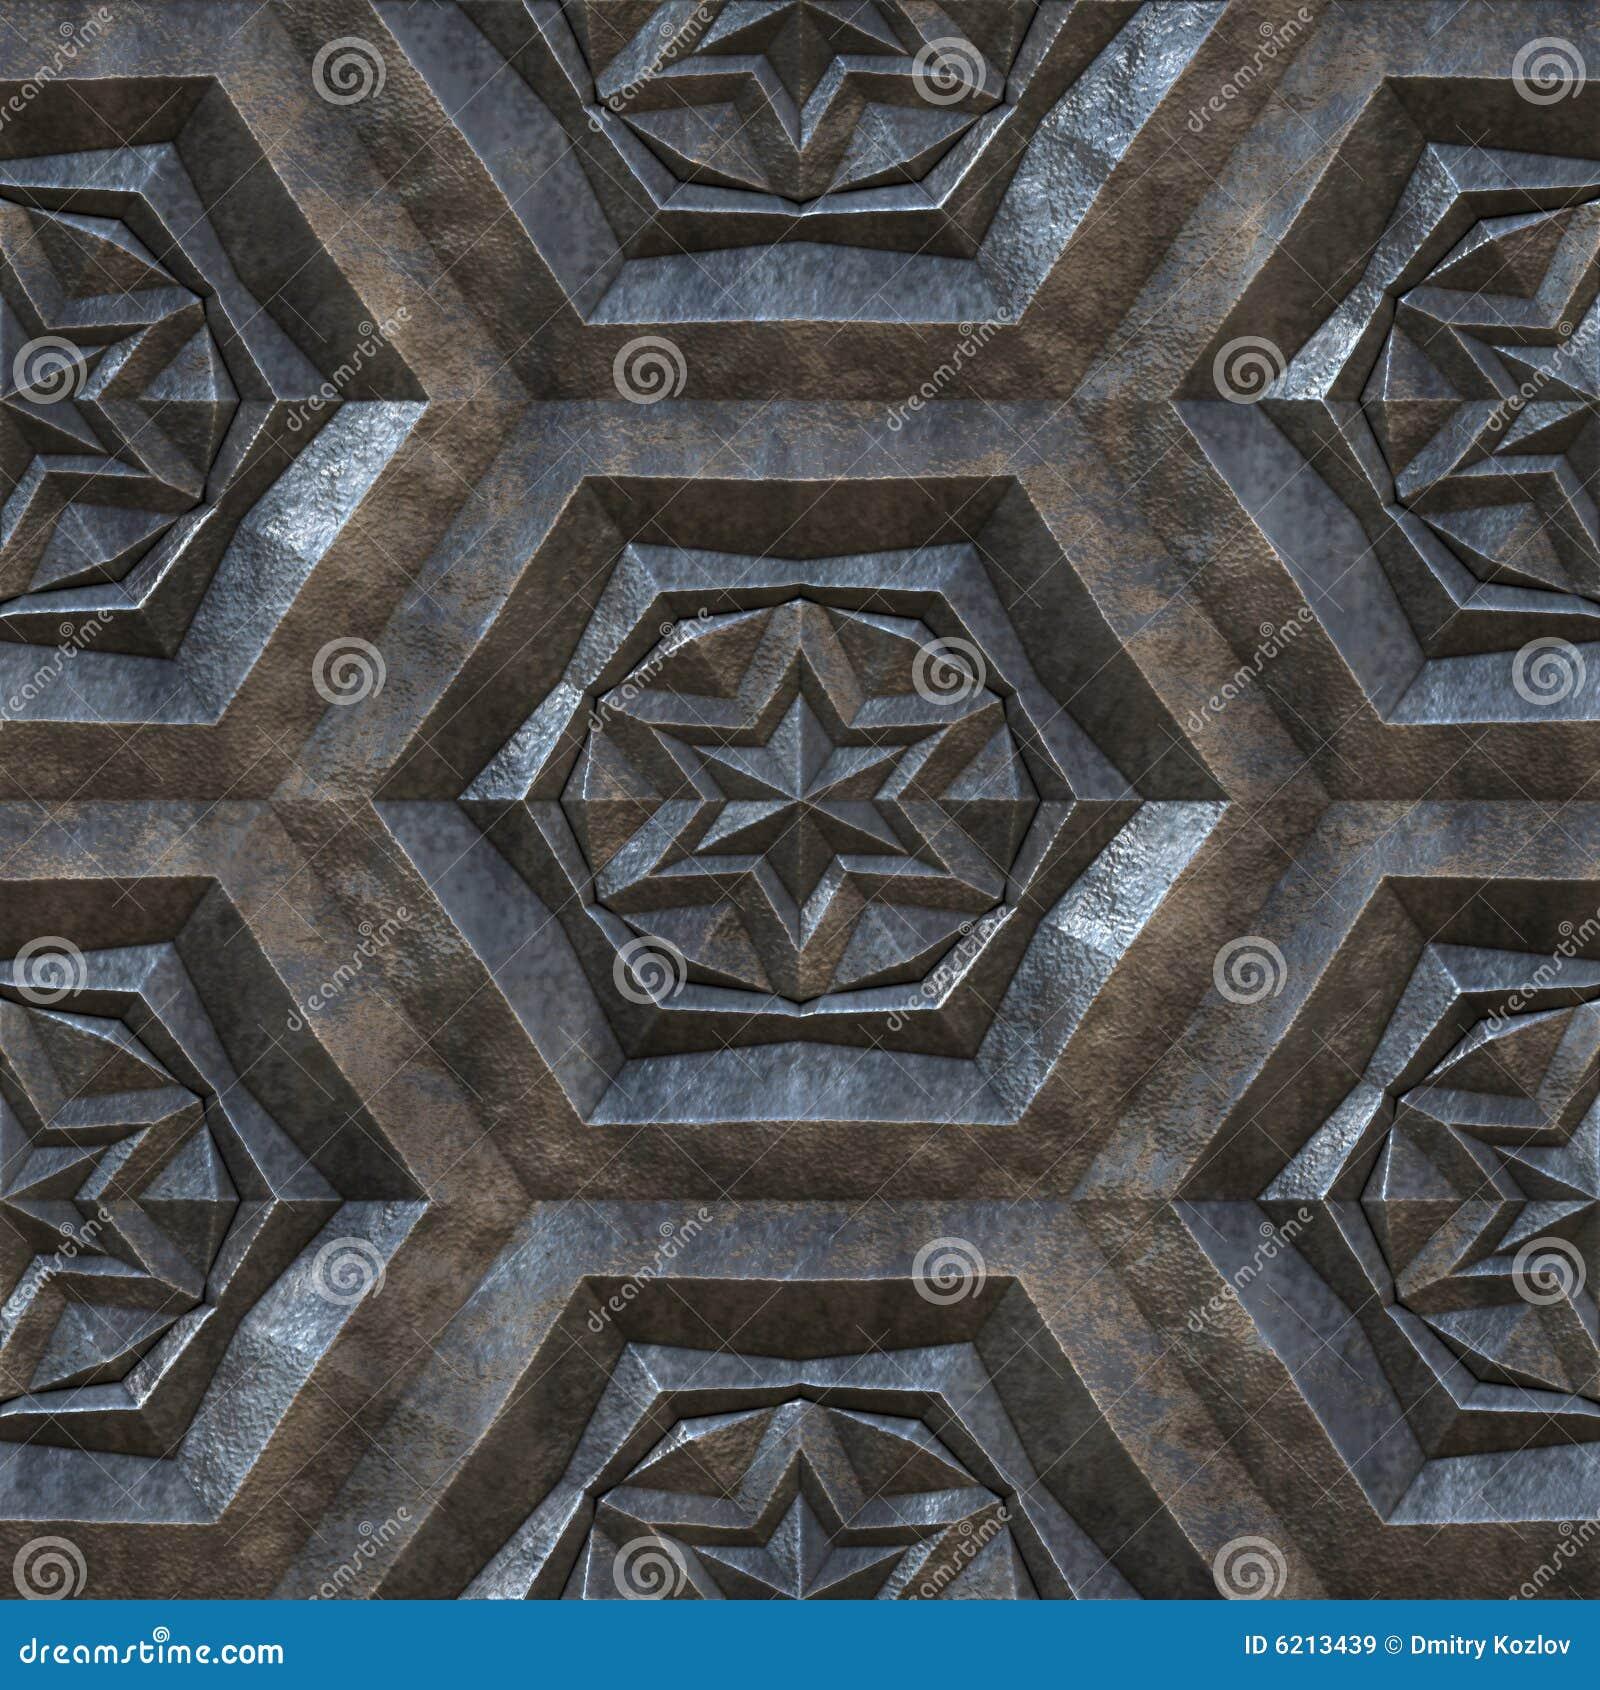 seamless metal wall texture. Seamless Metal Wall Texture S